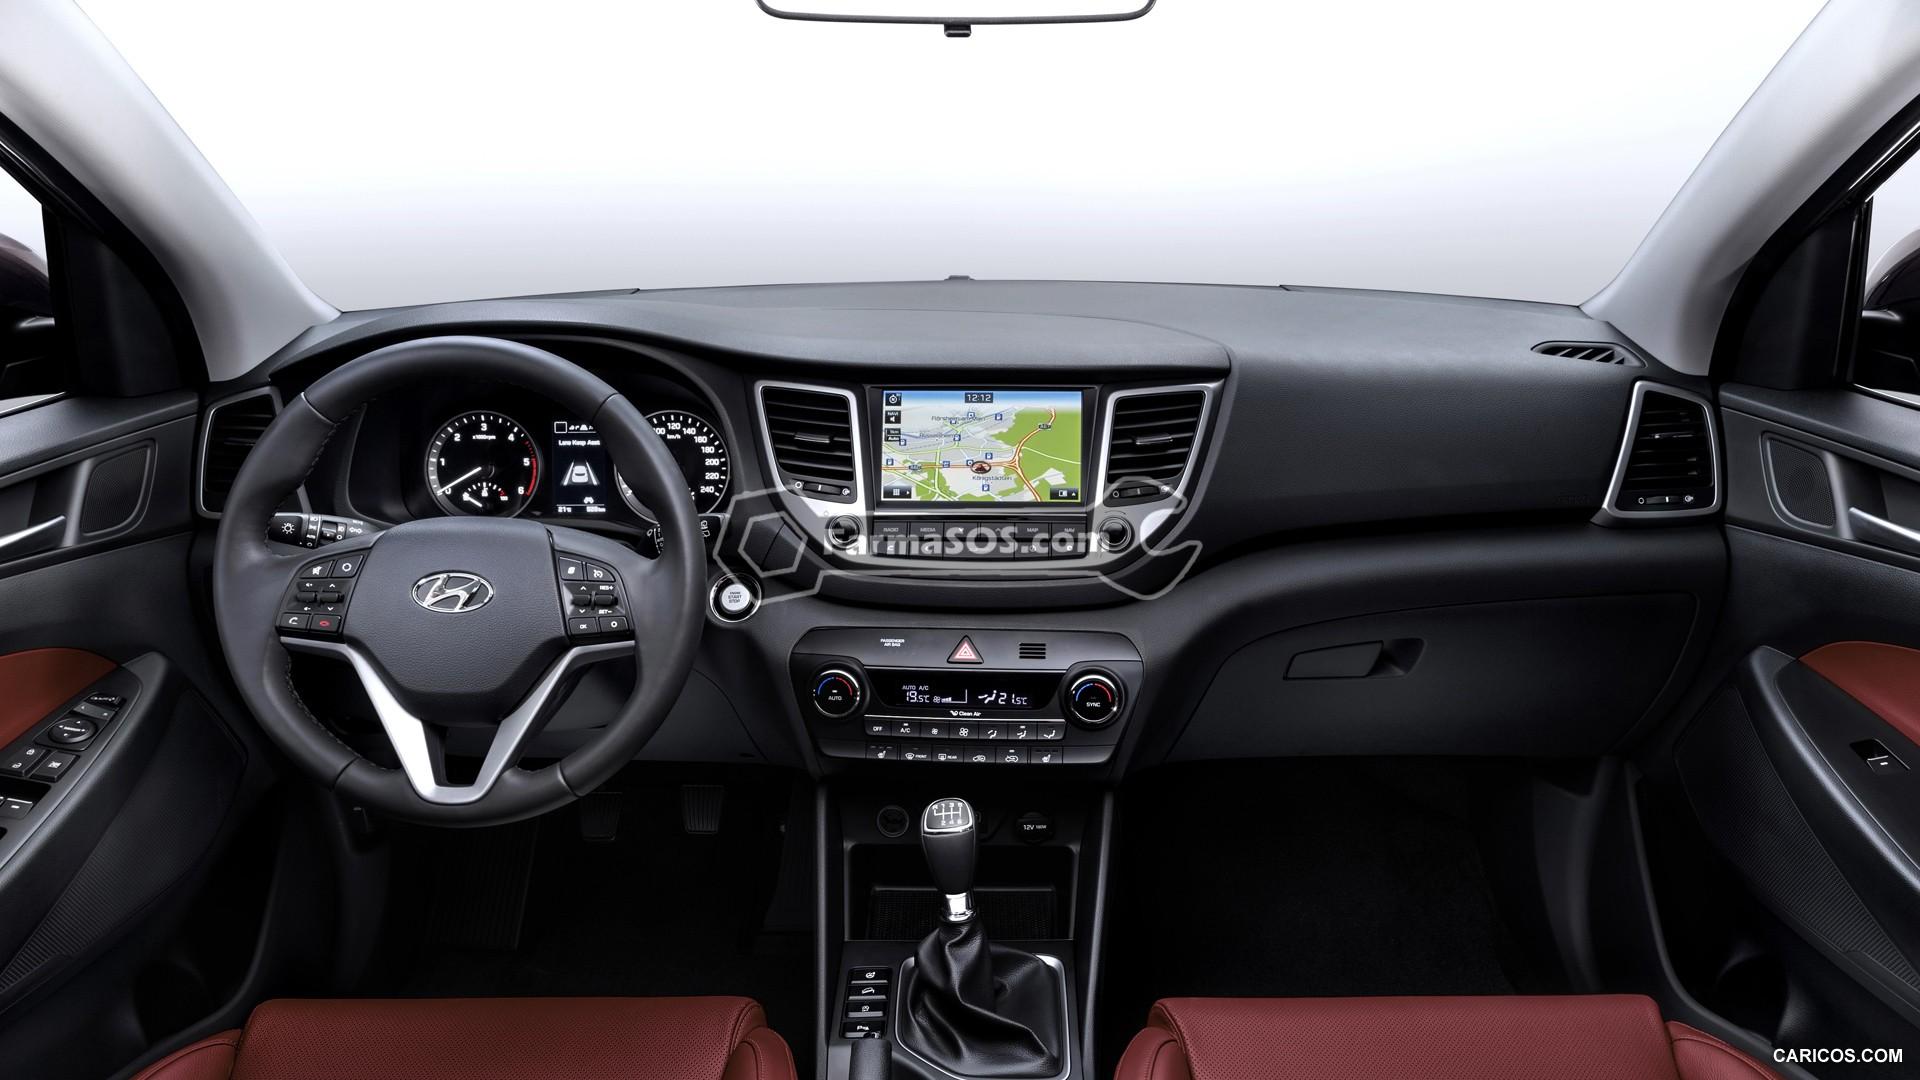 Hyundai Tucson 2015 2017 9 تصاویر هیوندای توسان مدل 2016 تا 2018